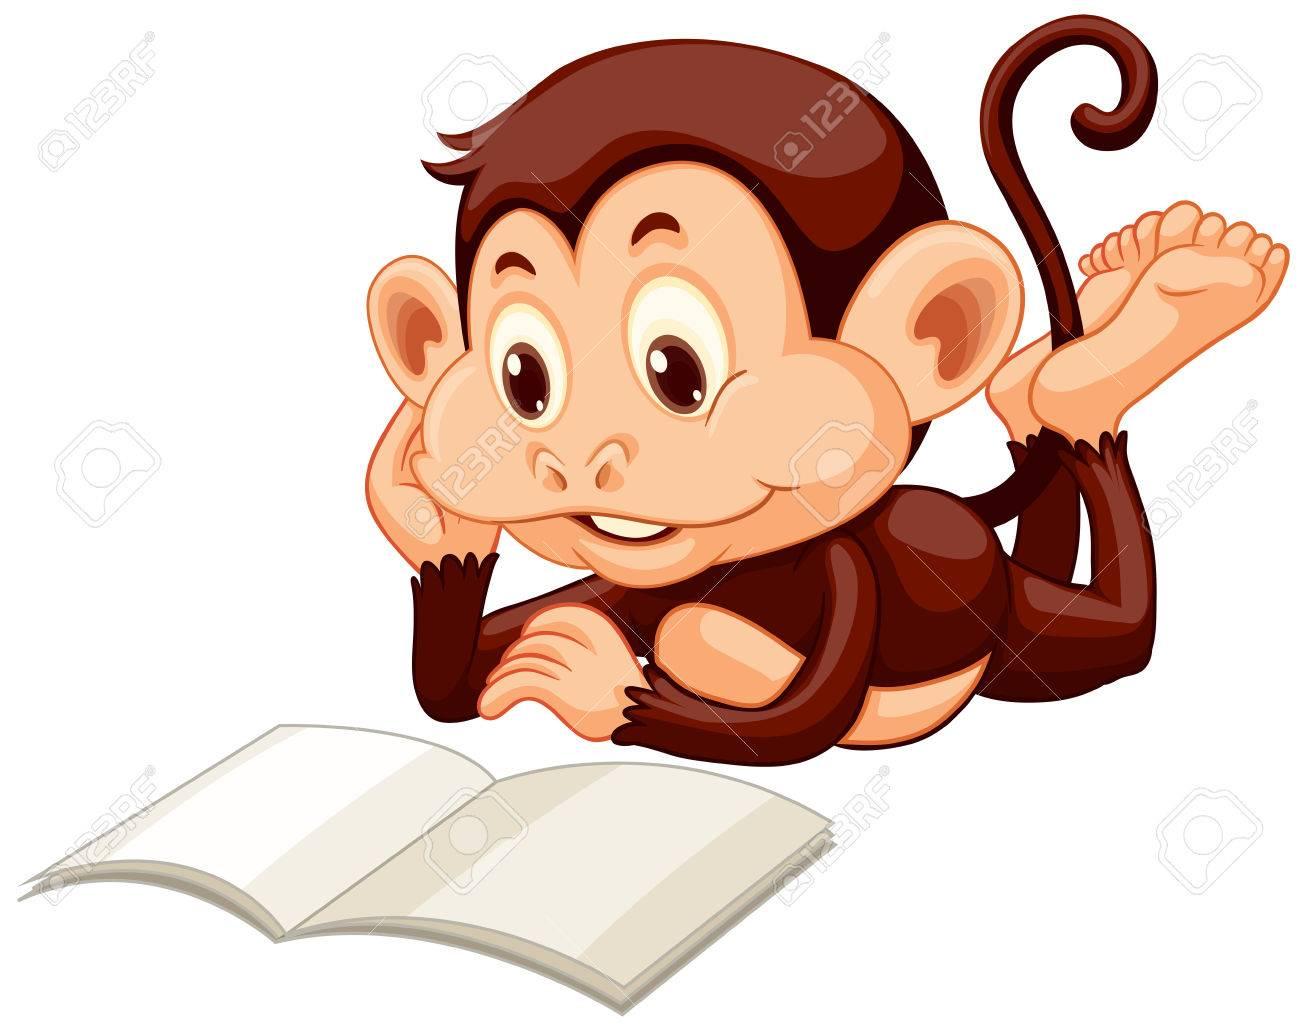 Little monkey reading a book illustration.